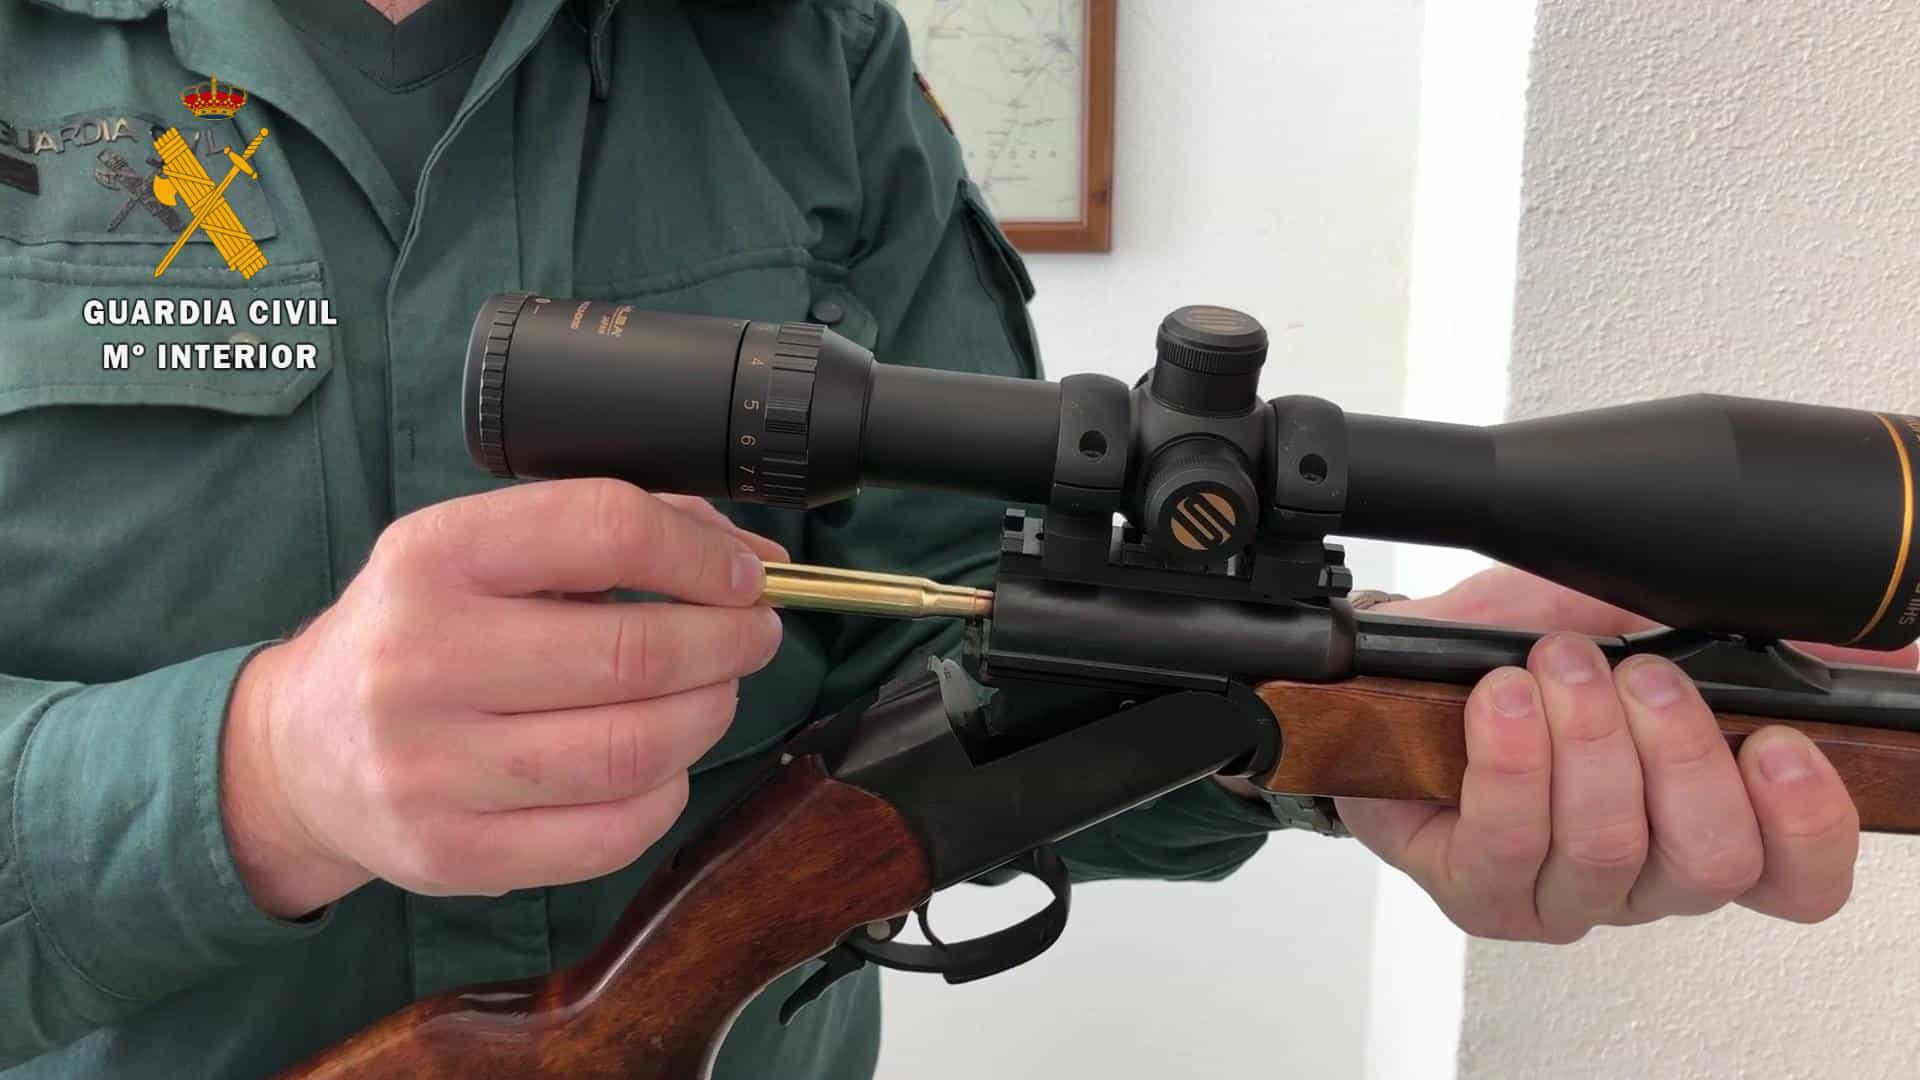 La Guardia Civil sorprende a tres cazadores furtivos en la Reserva Regional de Caza de Cameros-Demanda 1